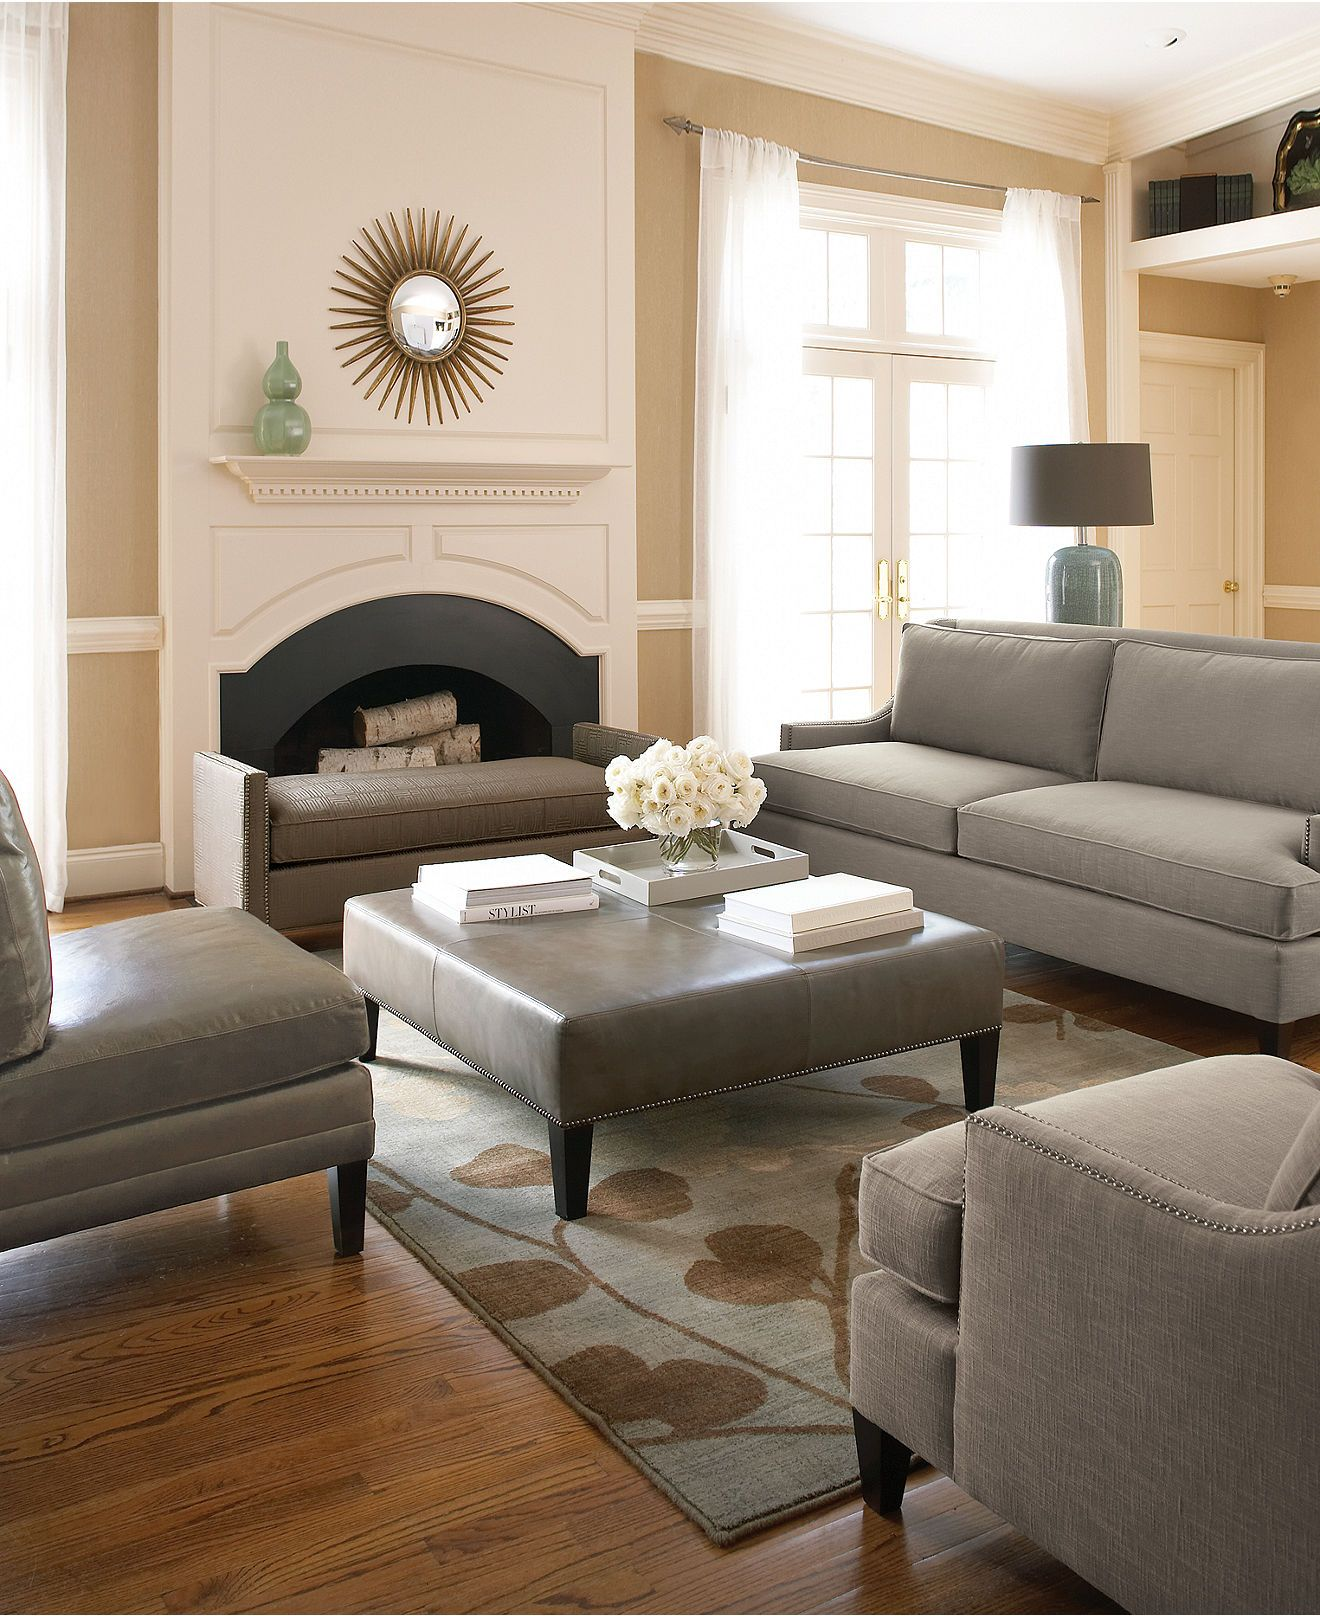 cocktail ottoman. Martha Stewart living room furniture, kent collection.